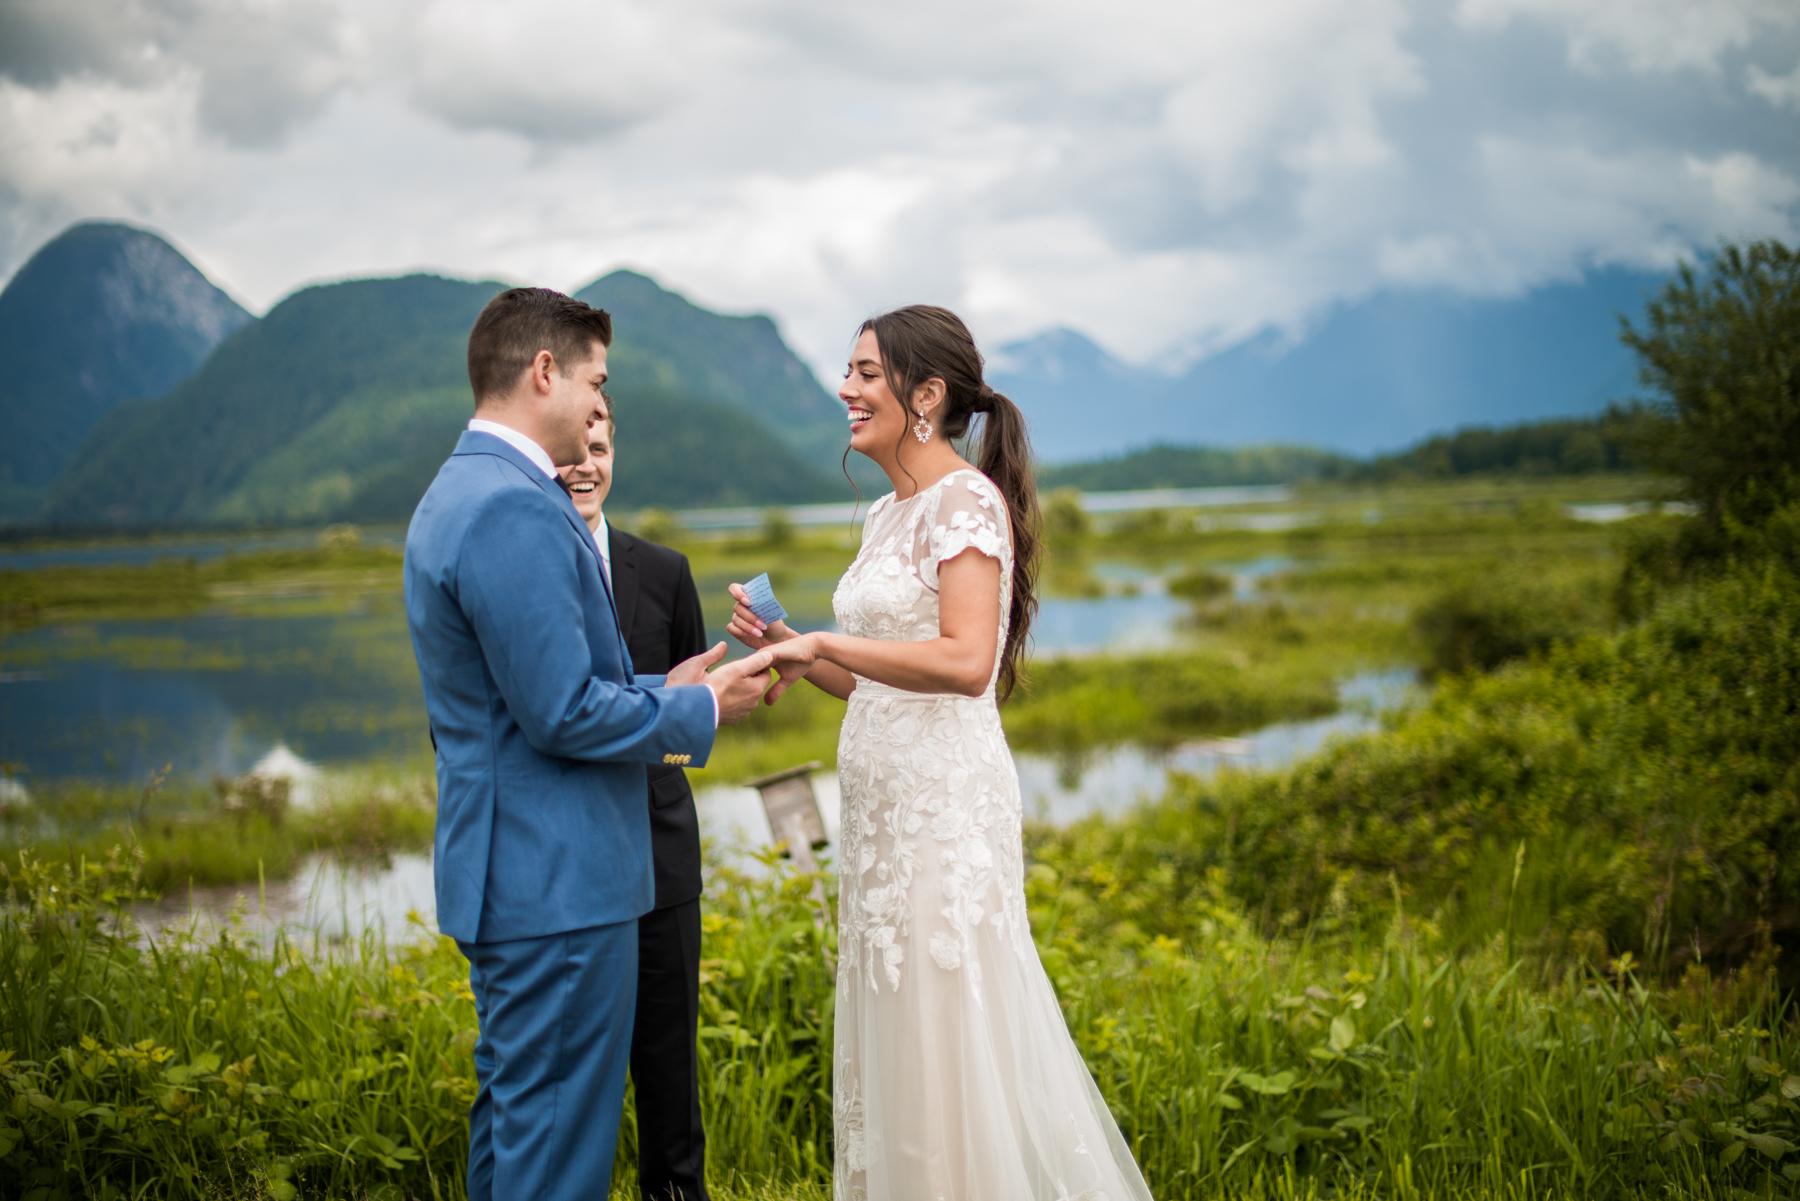 dp-wedding-web-072